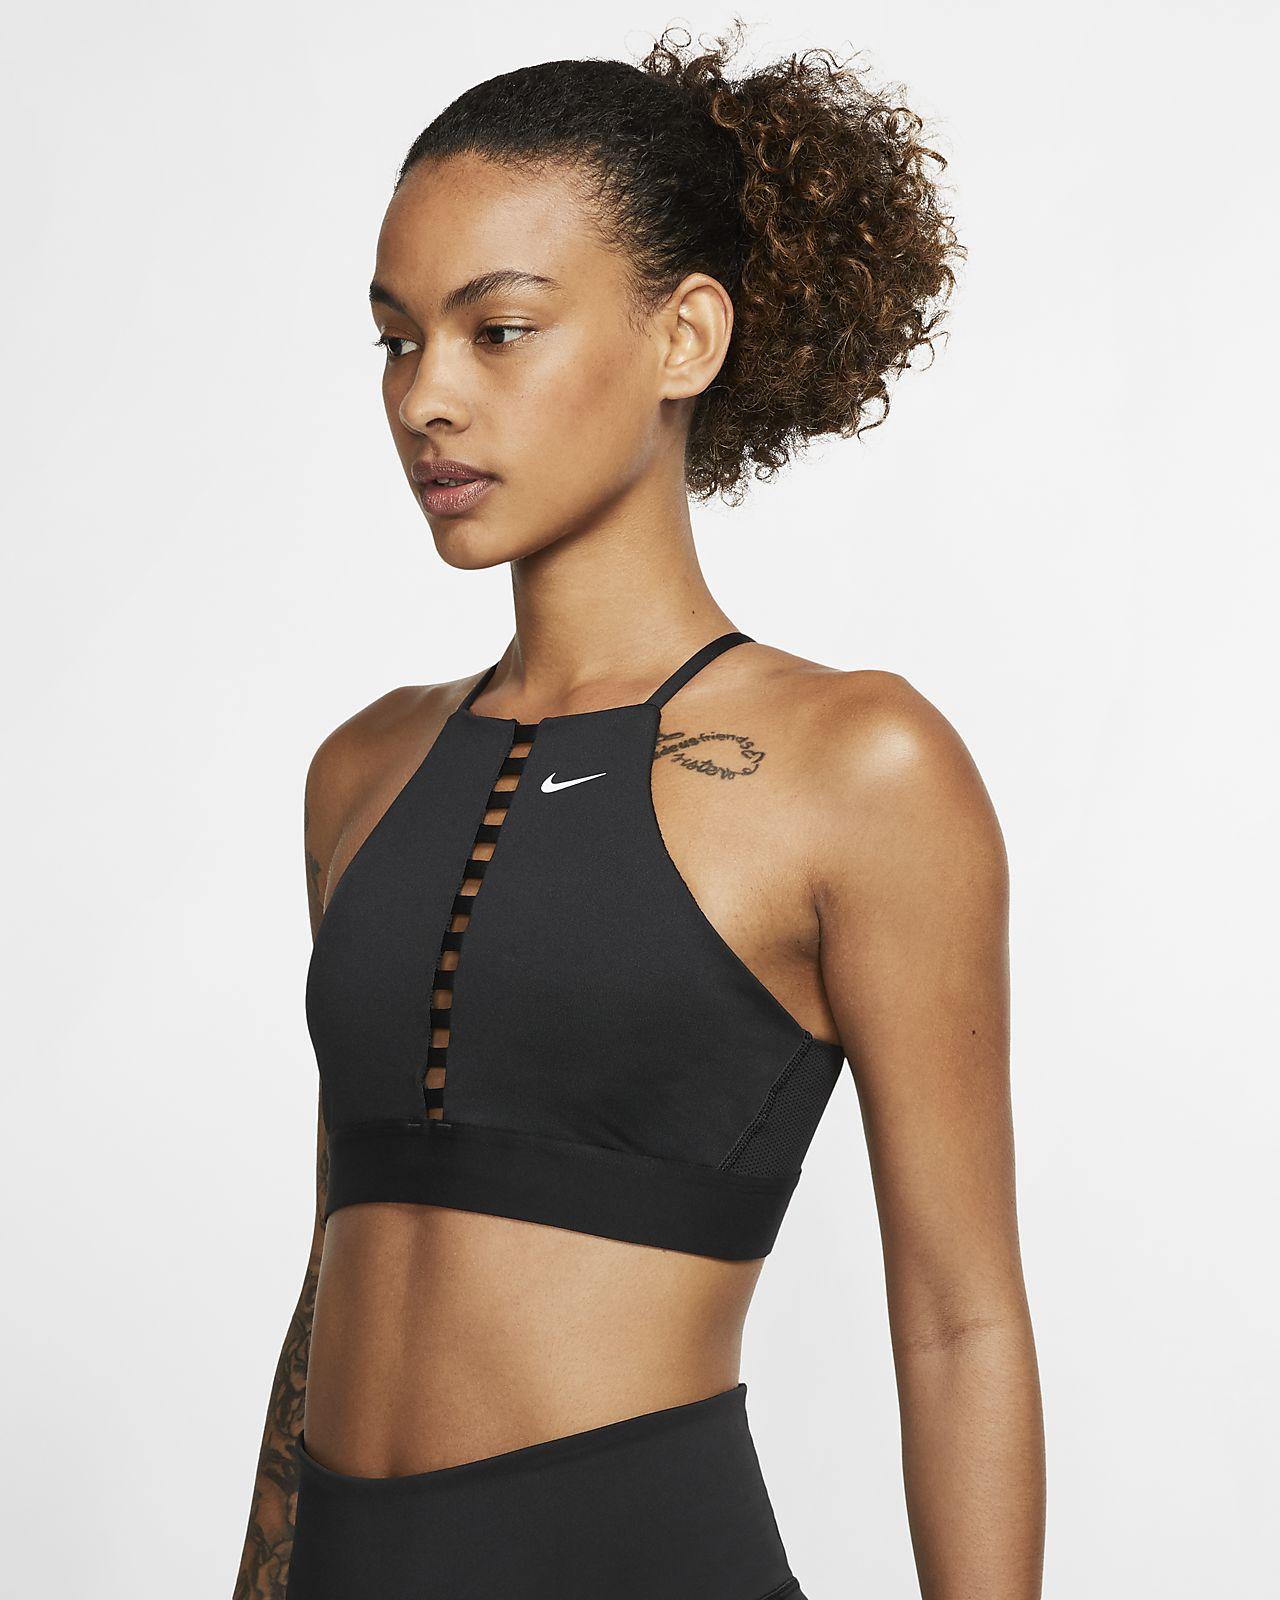 4645450385dcdf Nike Indy Women's Light Support Yoga Sports Bra. Nike.com